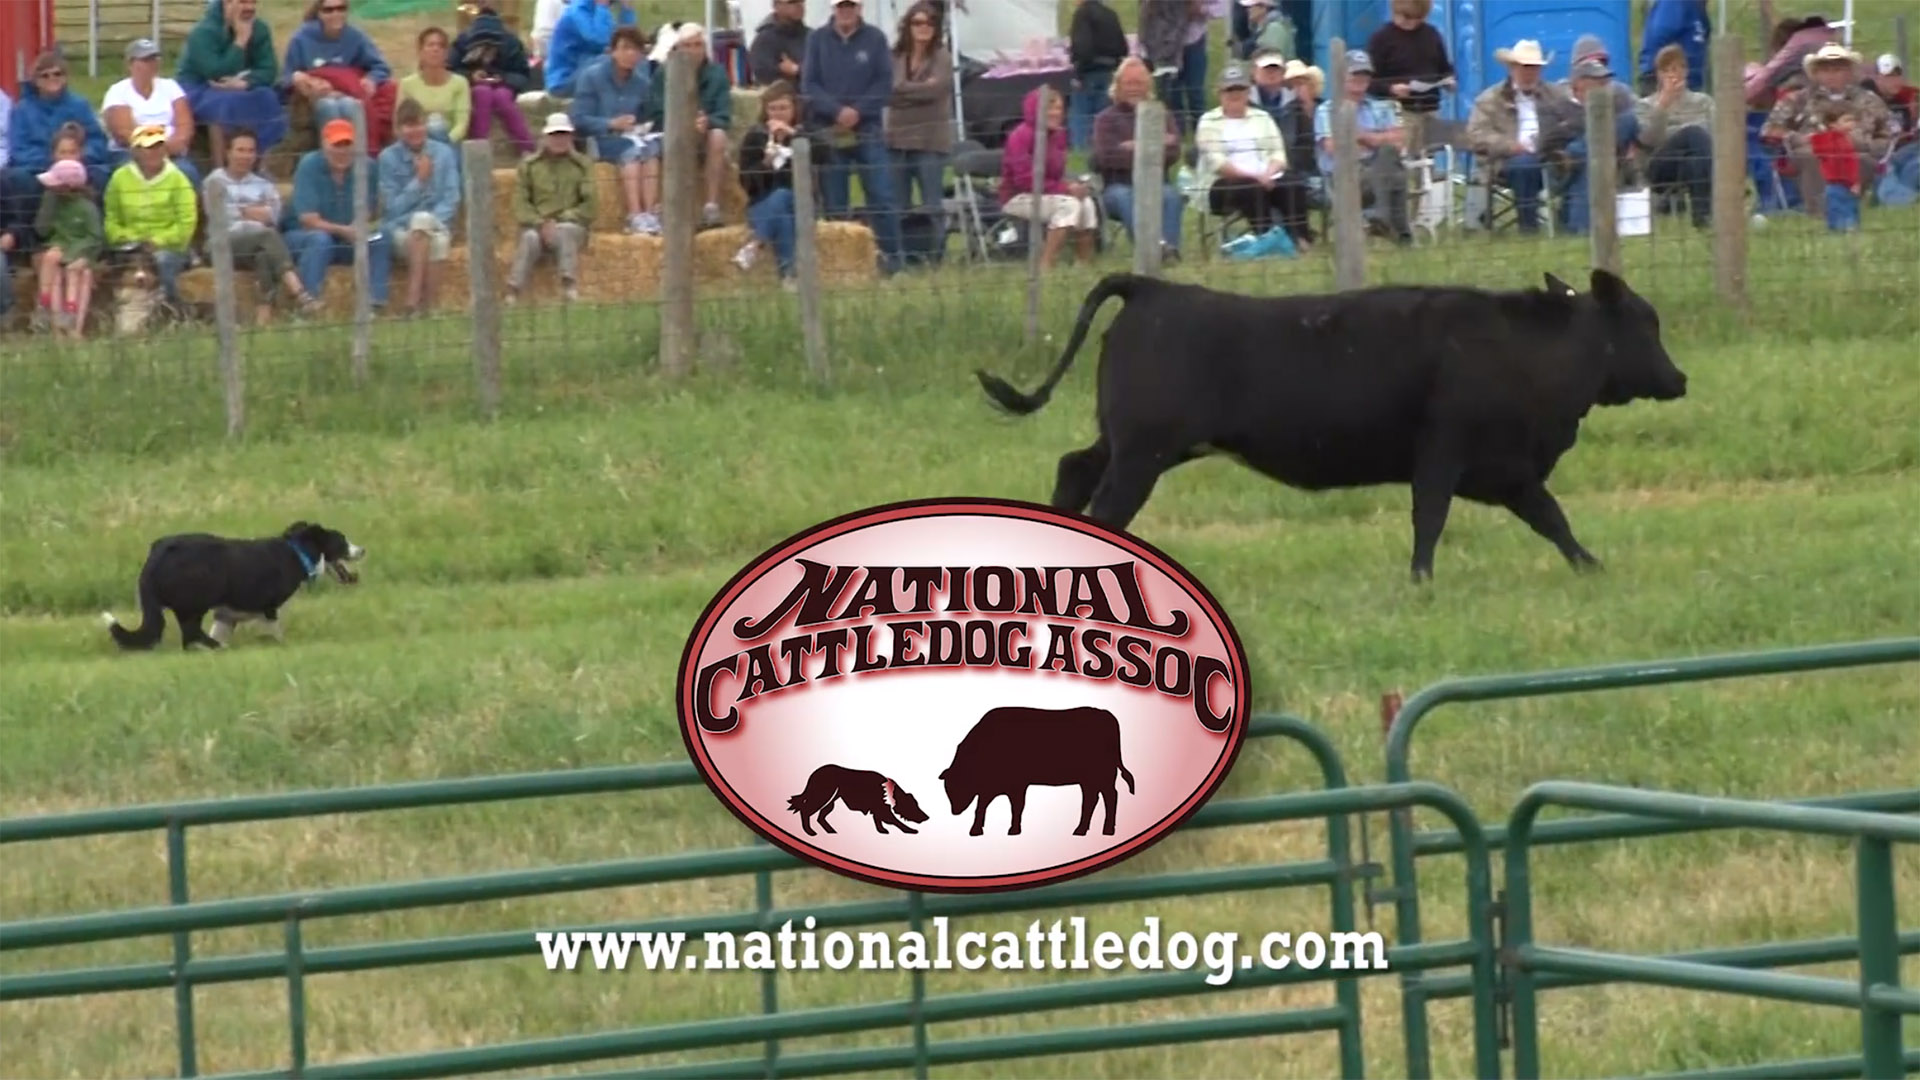 National Cattledog Association video. Omaha Video Production Company LP Photo Video.